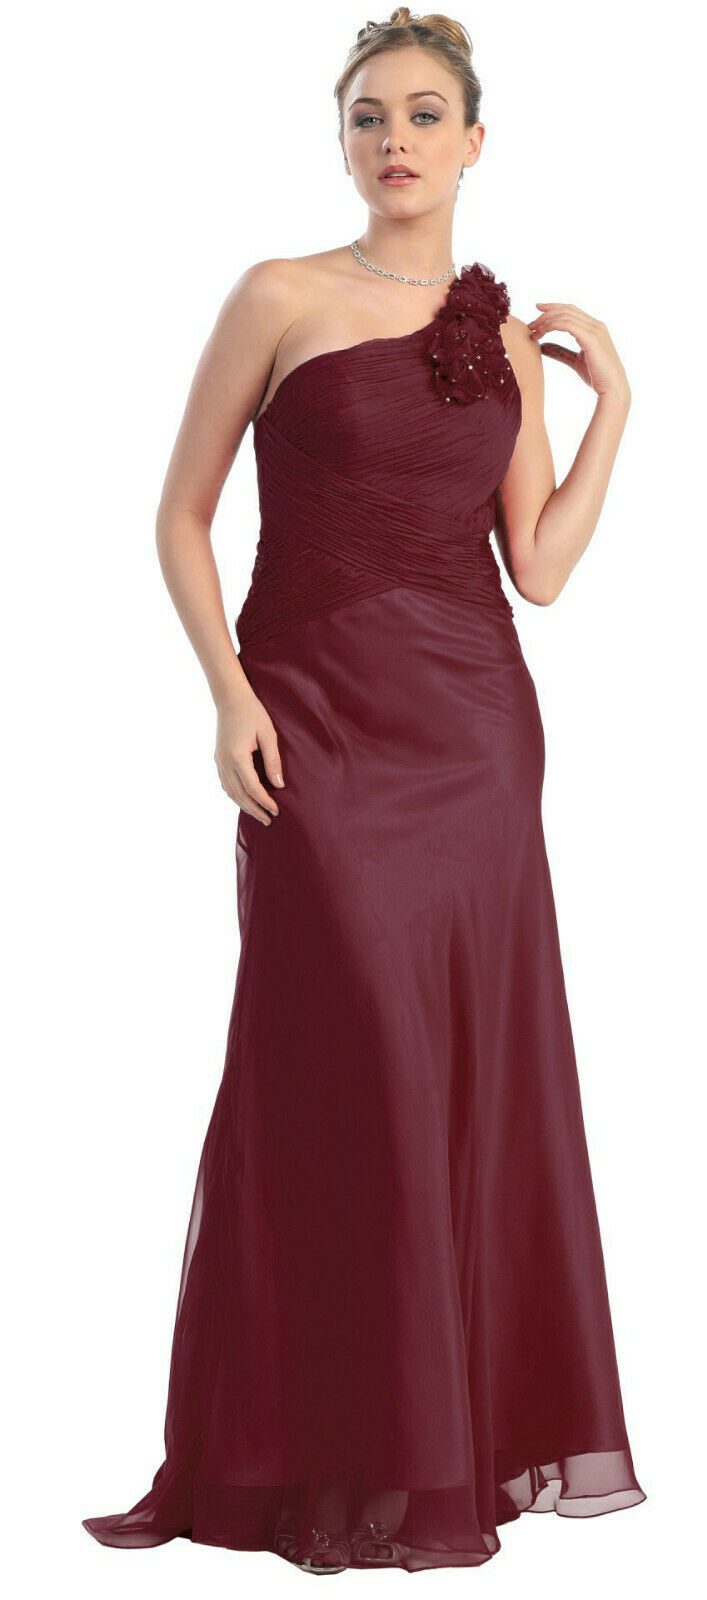 Abendkleid Abi-Ballkleid Brautjungfernkleid Brautmutterkleid Vintage Boho Gr 44